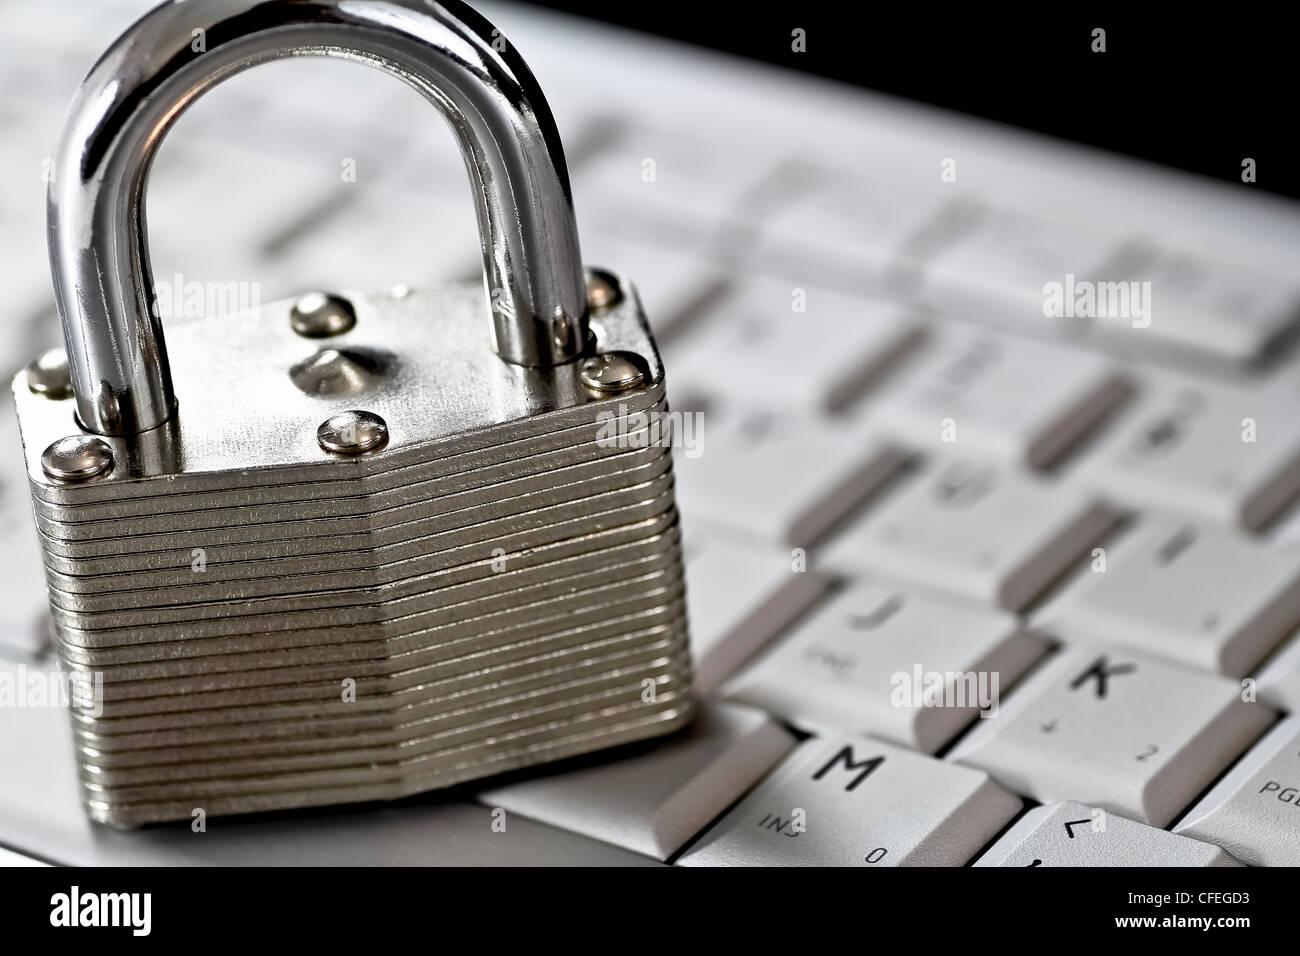 locked padlock on computer keyboard - Stock Image